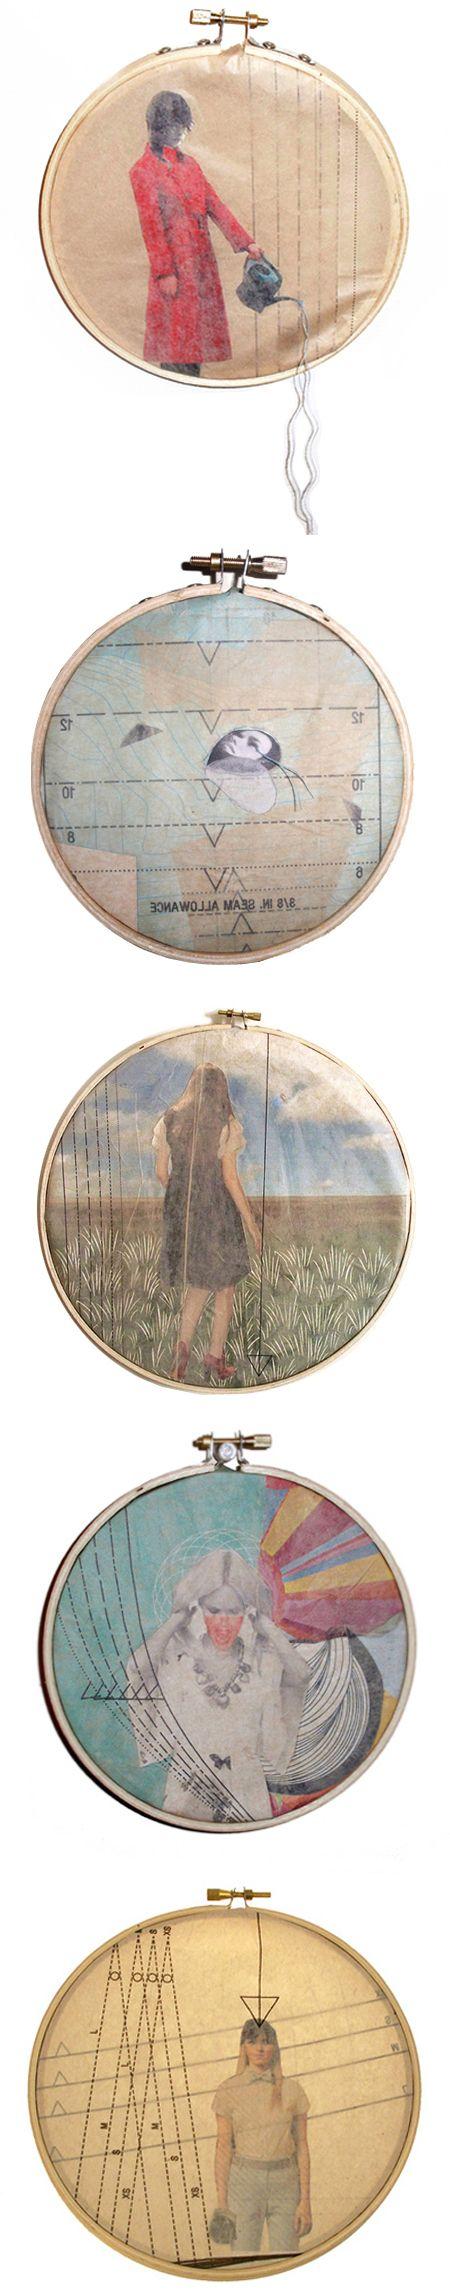 American artist Lillianna Pereira's embroidery rings